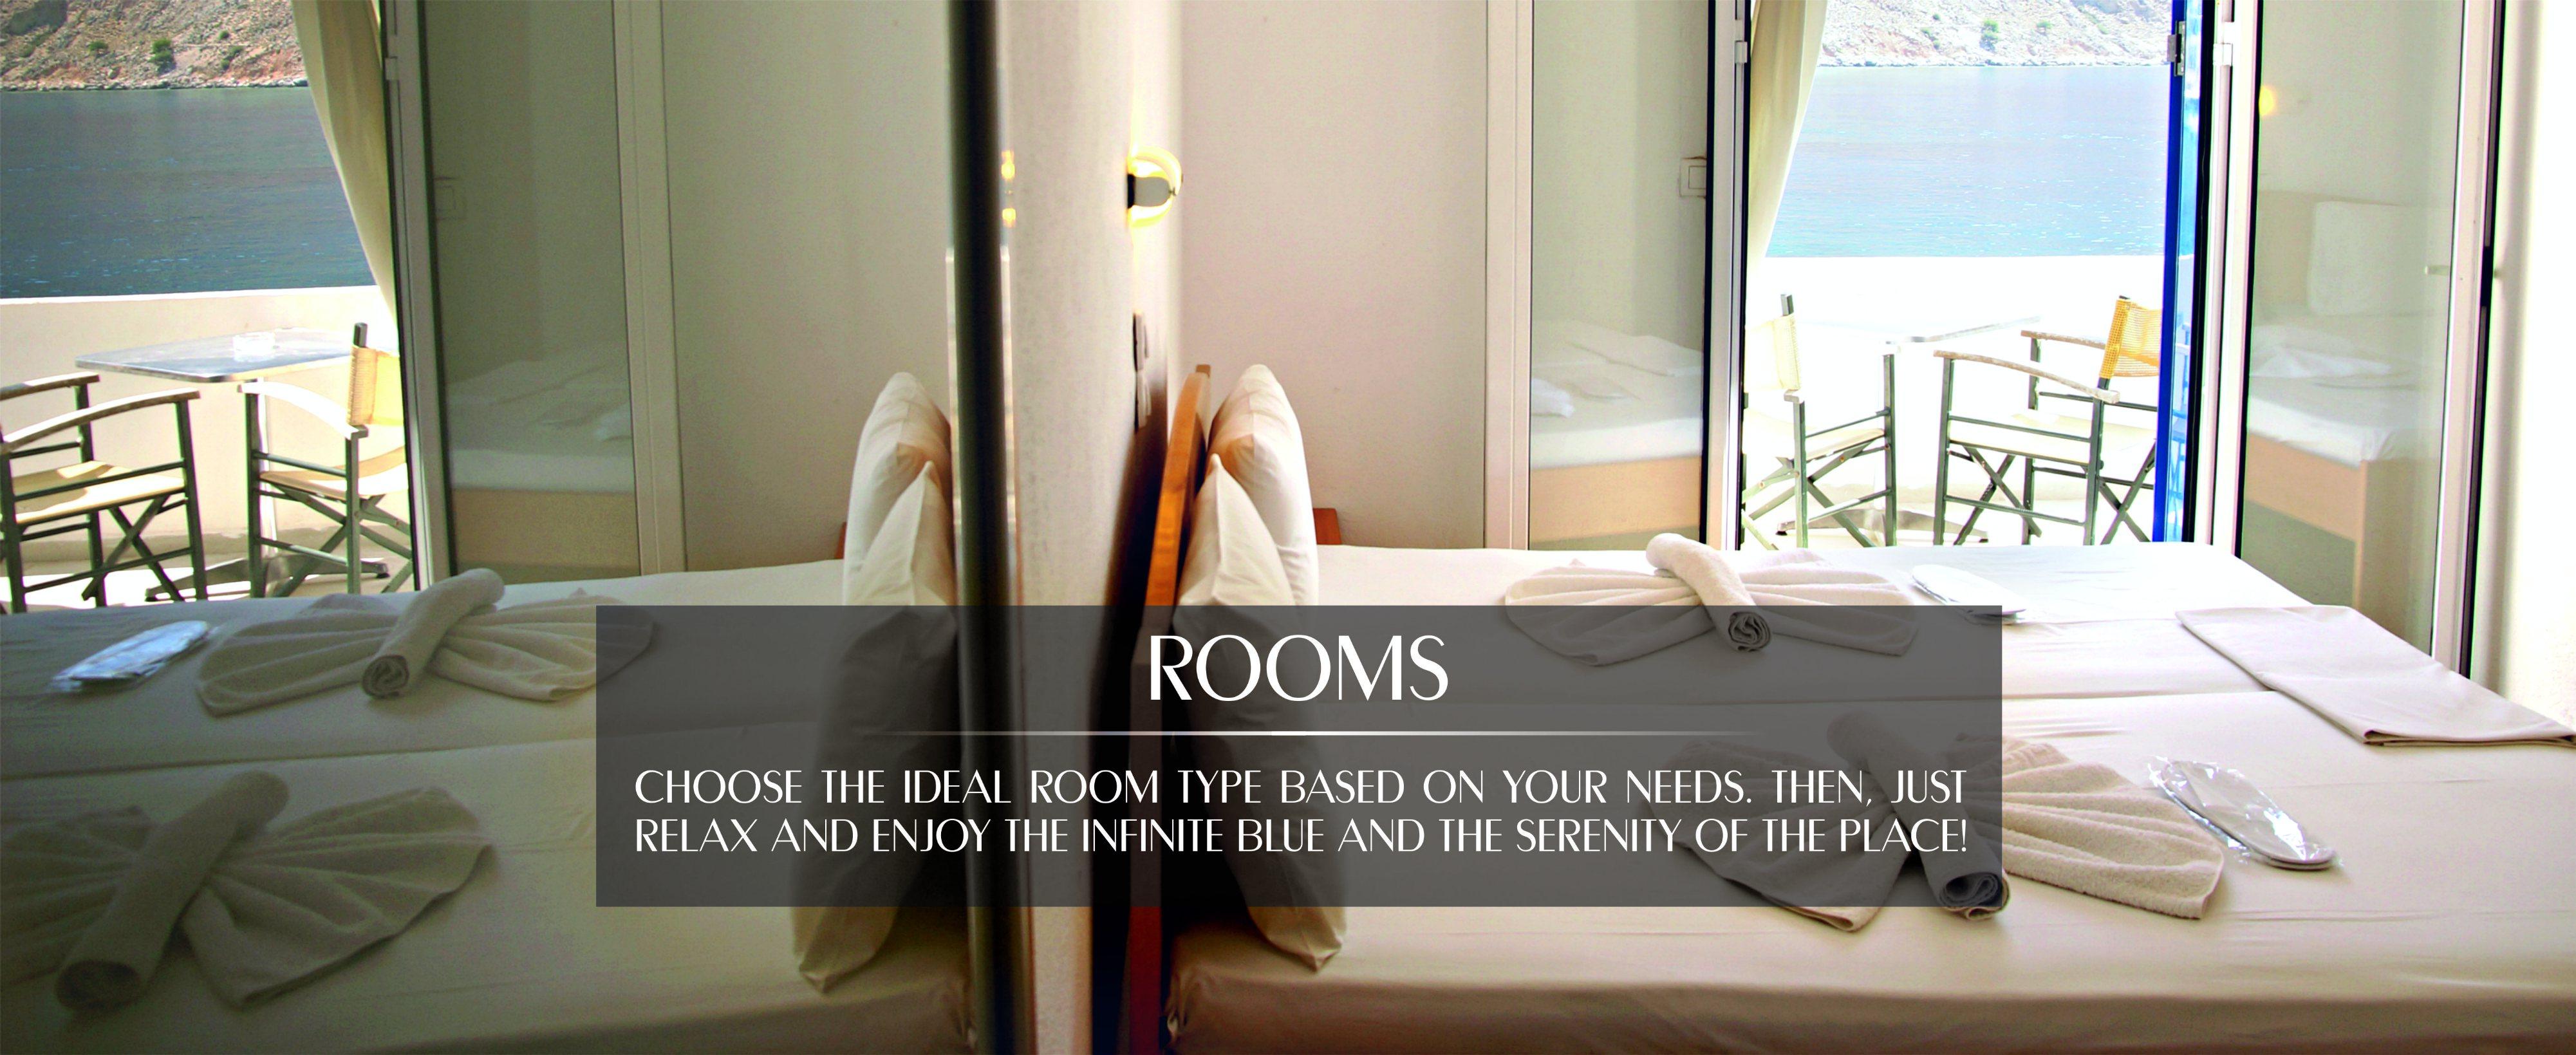 rooms_wallpaper_680kb